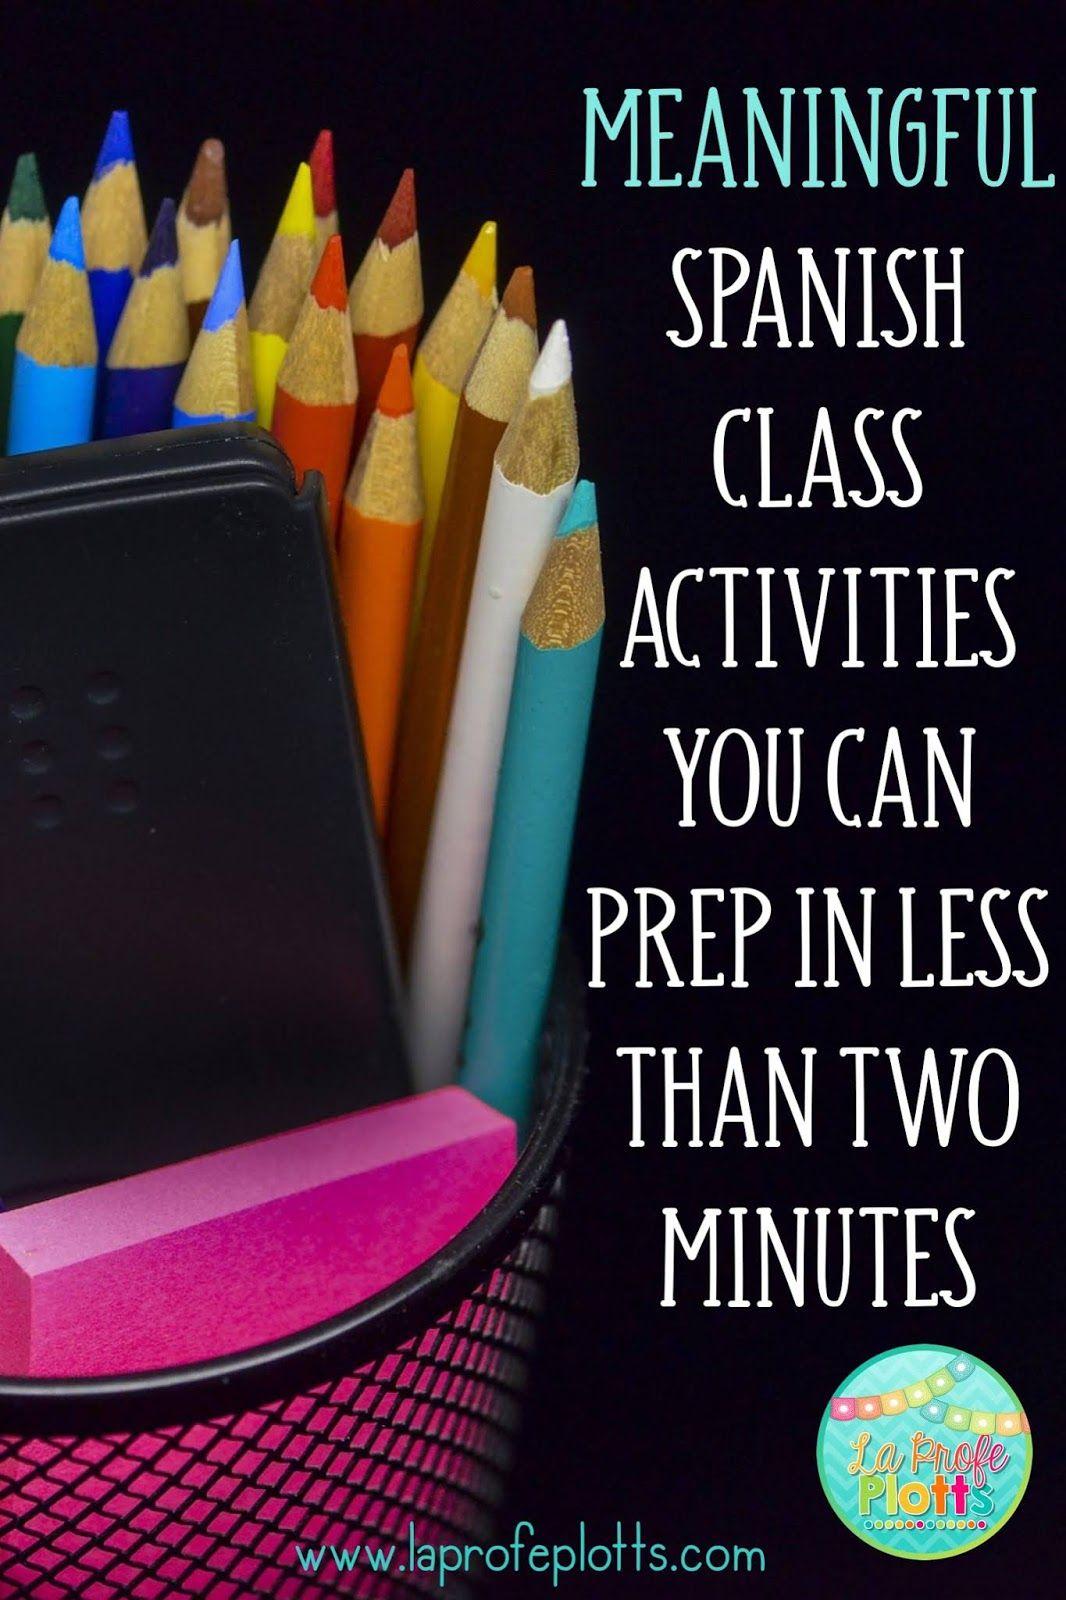 La Profe Plotts Classroom Little To No Prep Spanish